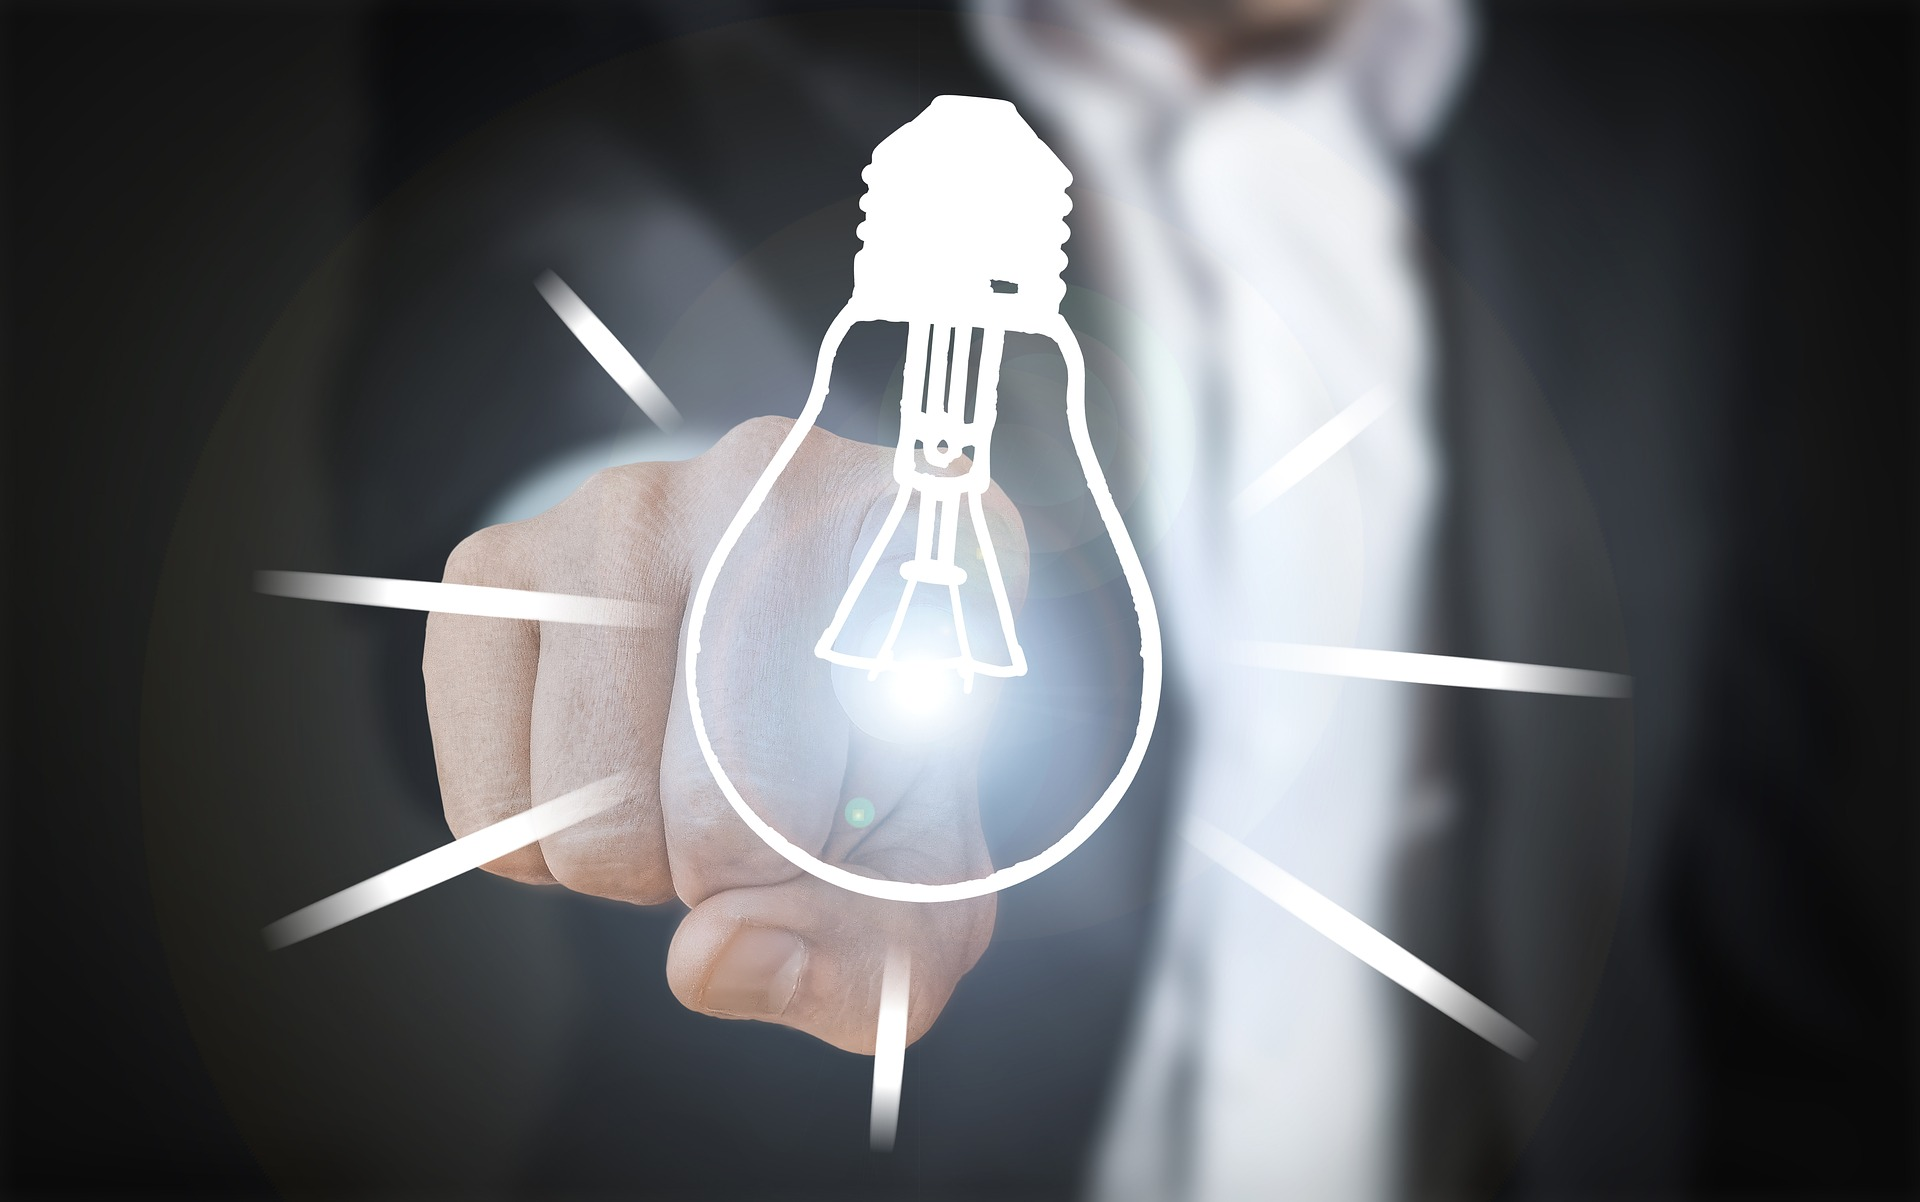 Berühmt Glühbirne Drahtbatterie Experiment Bilder - Elektrische ...